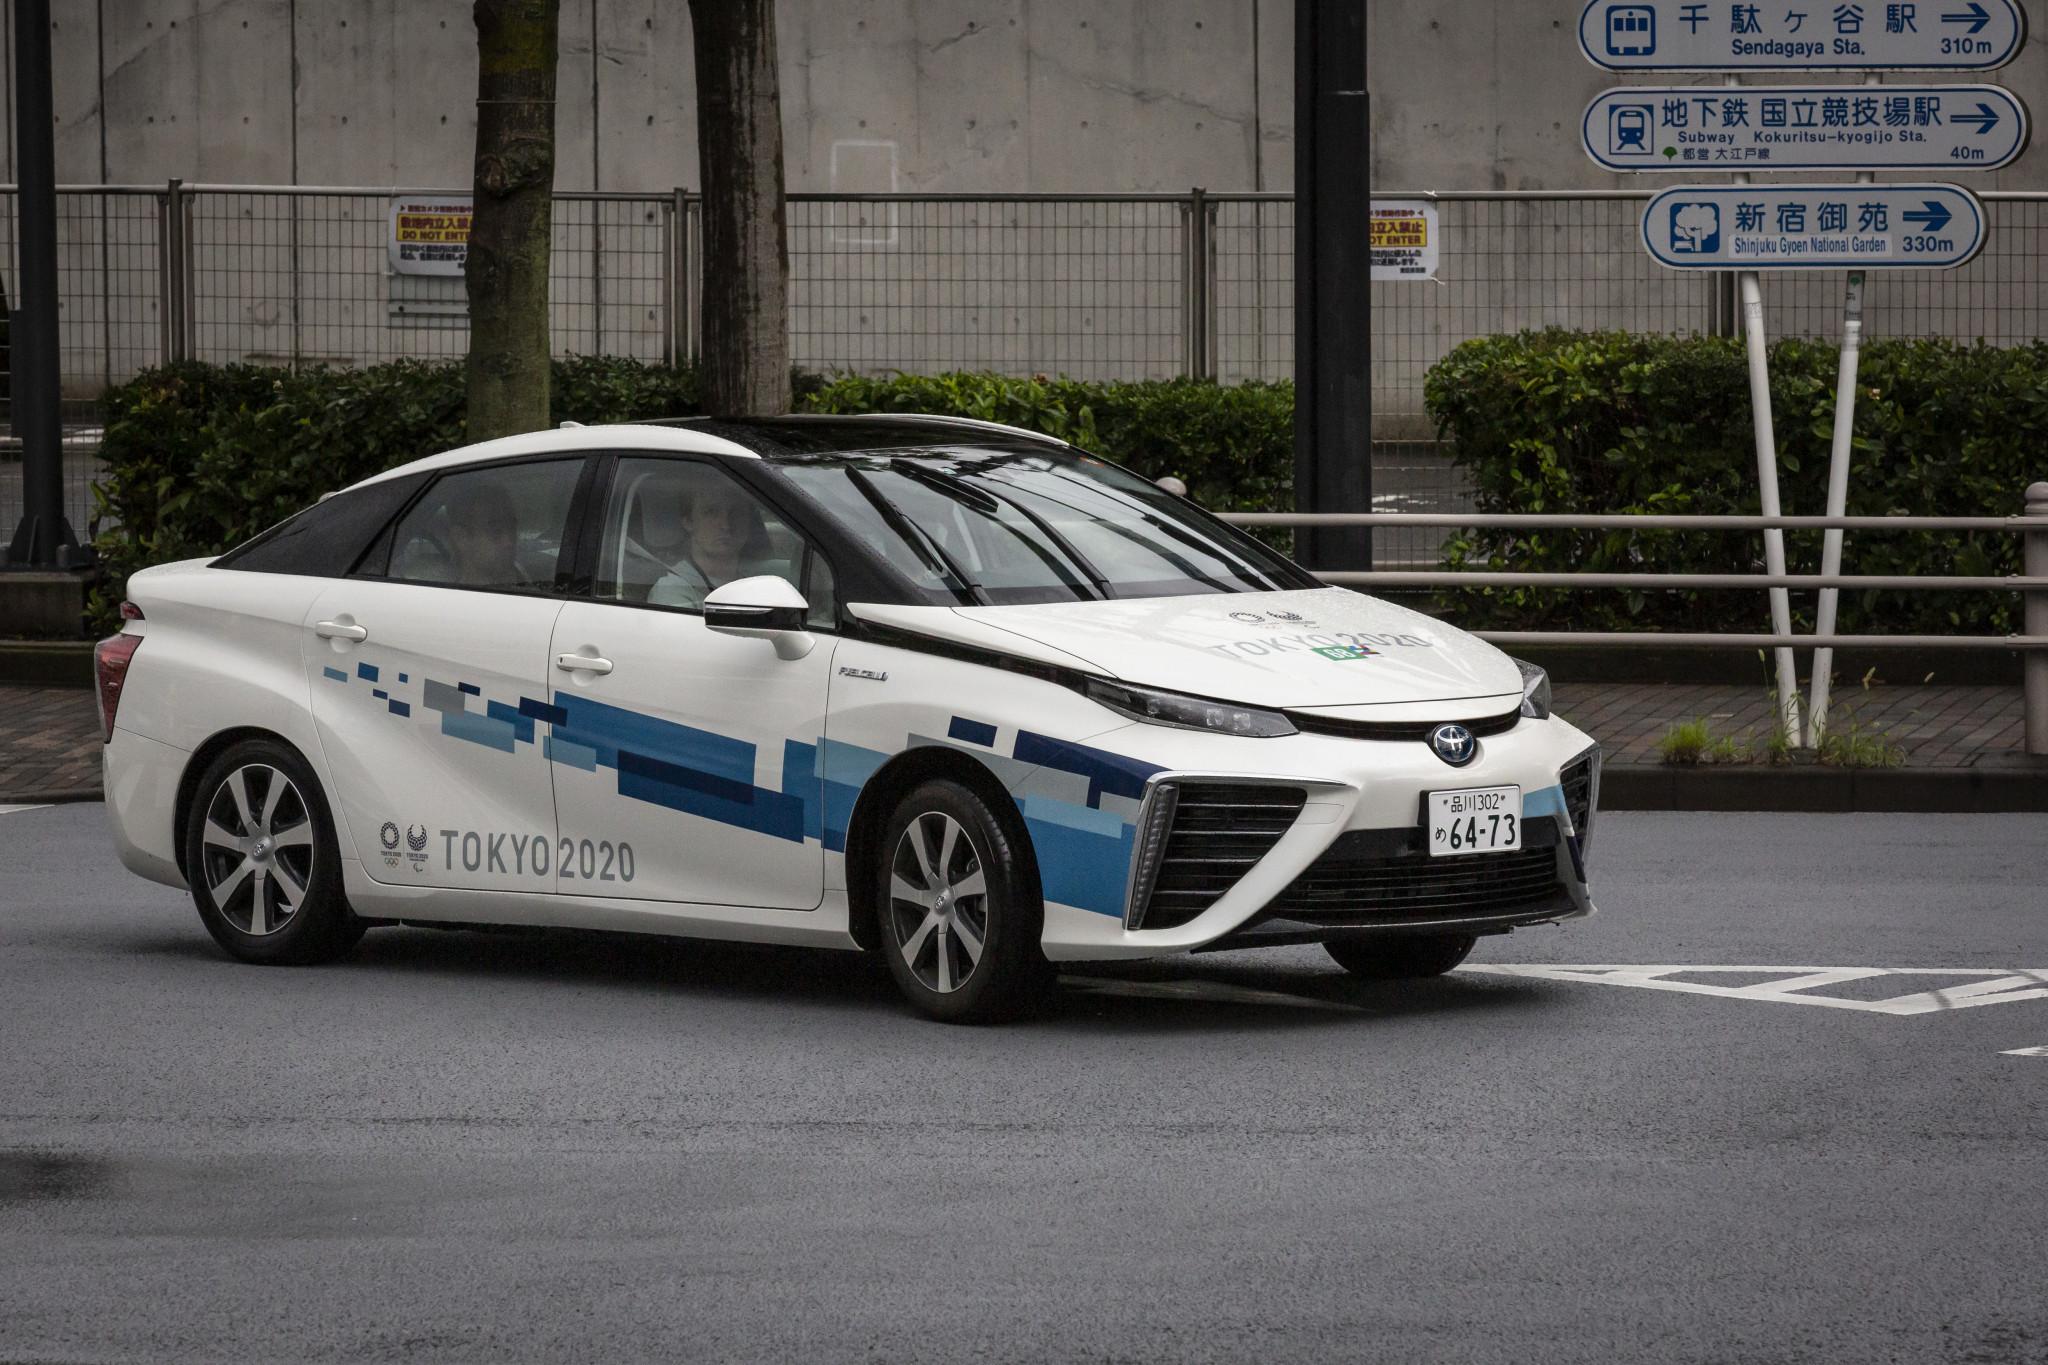 Olympic sponsor Bridgestone outlines support for Tokyo 2020